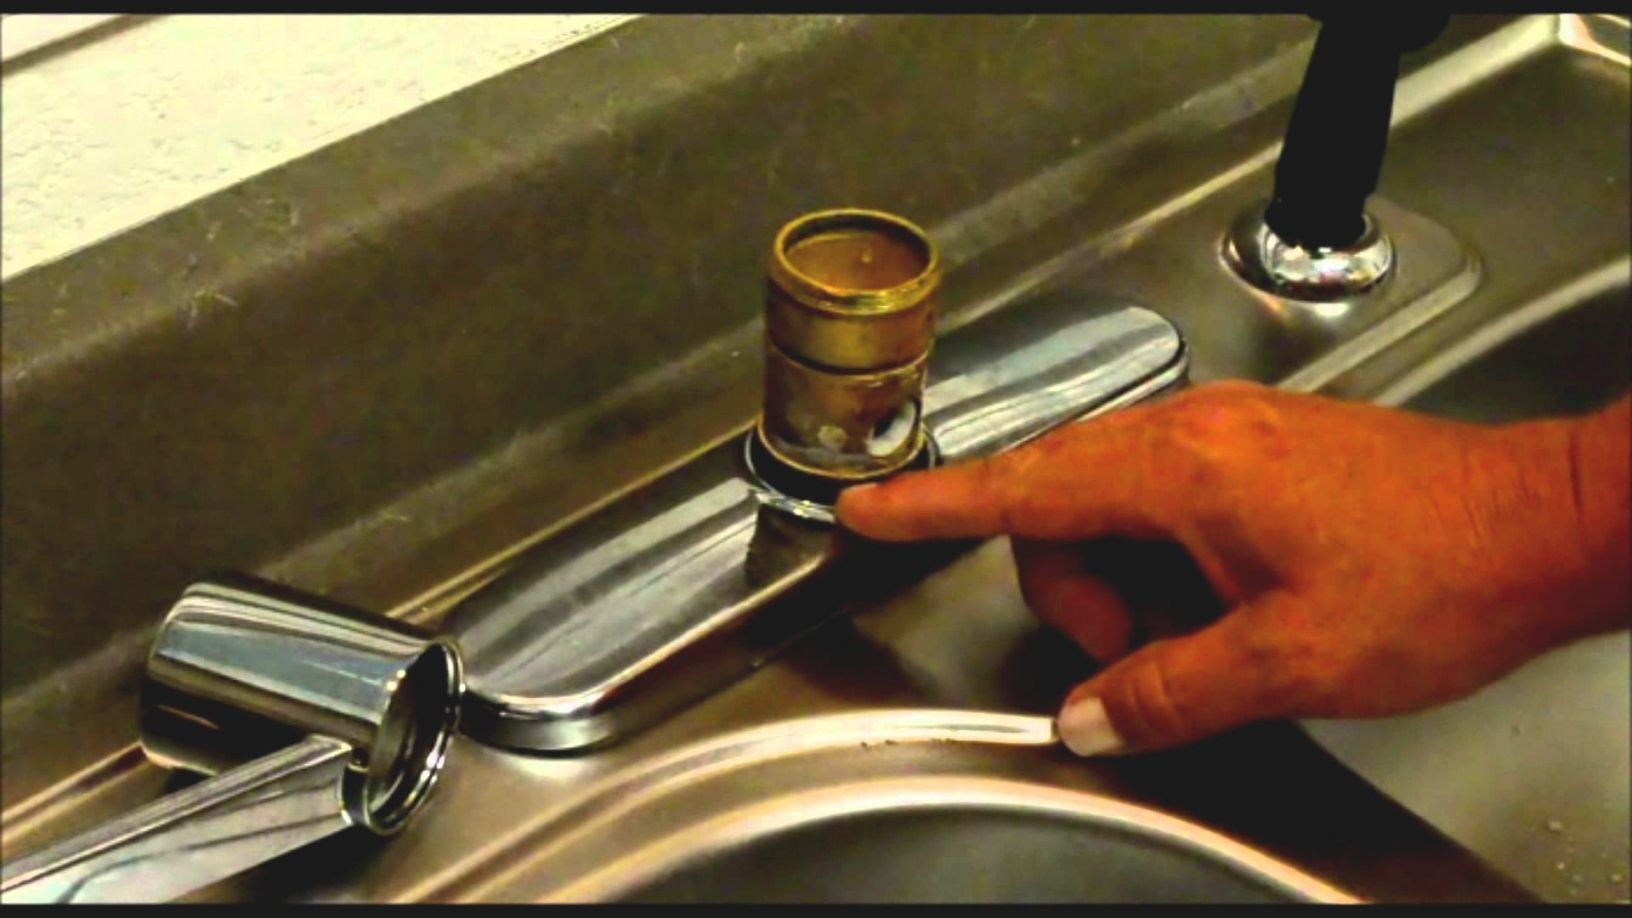 Kitchenfaucetleakingatbase Kitchen Faucet Repair Faucet Repair